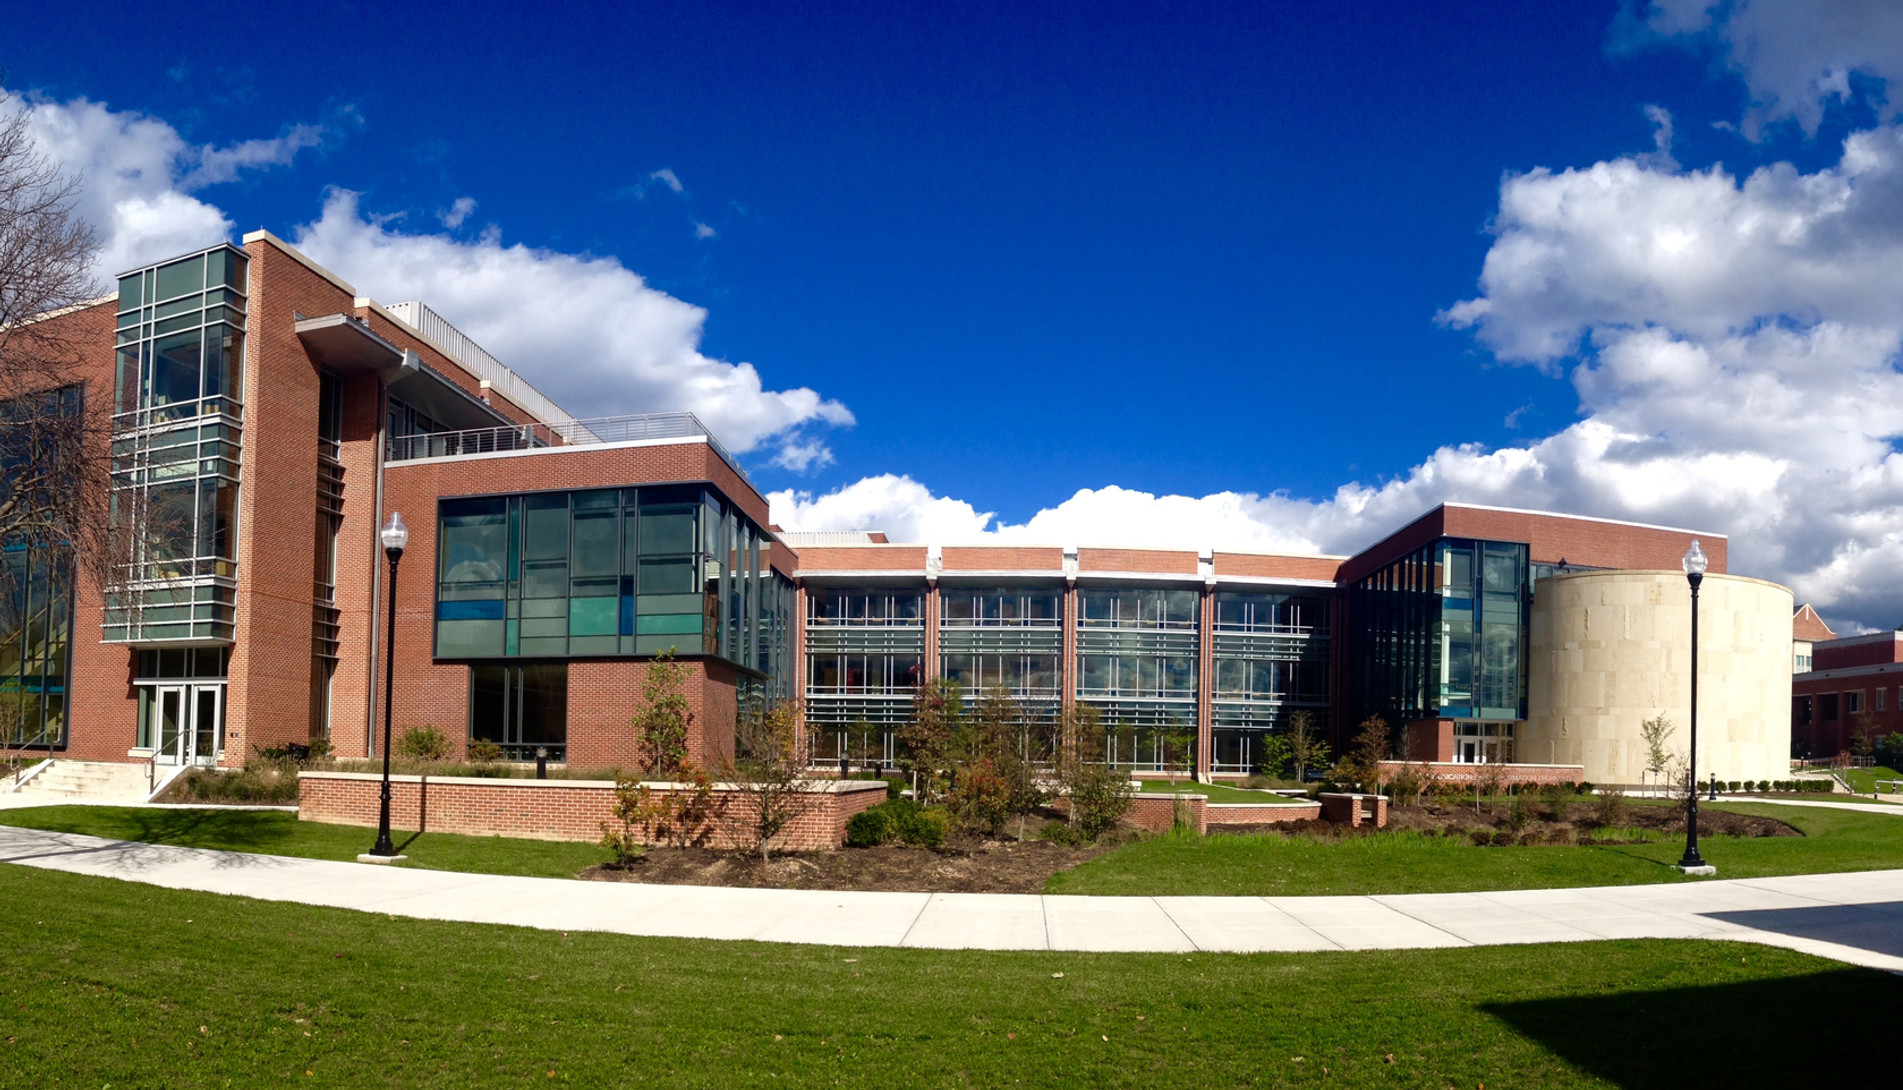 Xi Omega - Frostburg State University